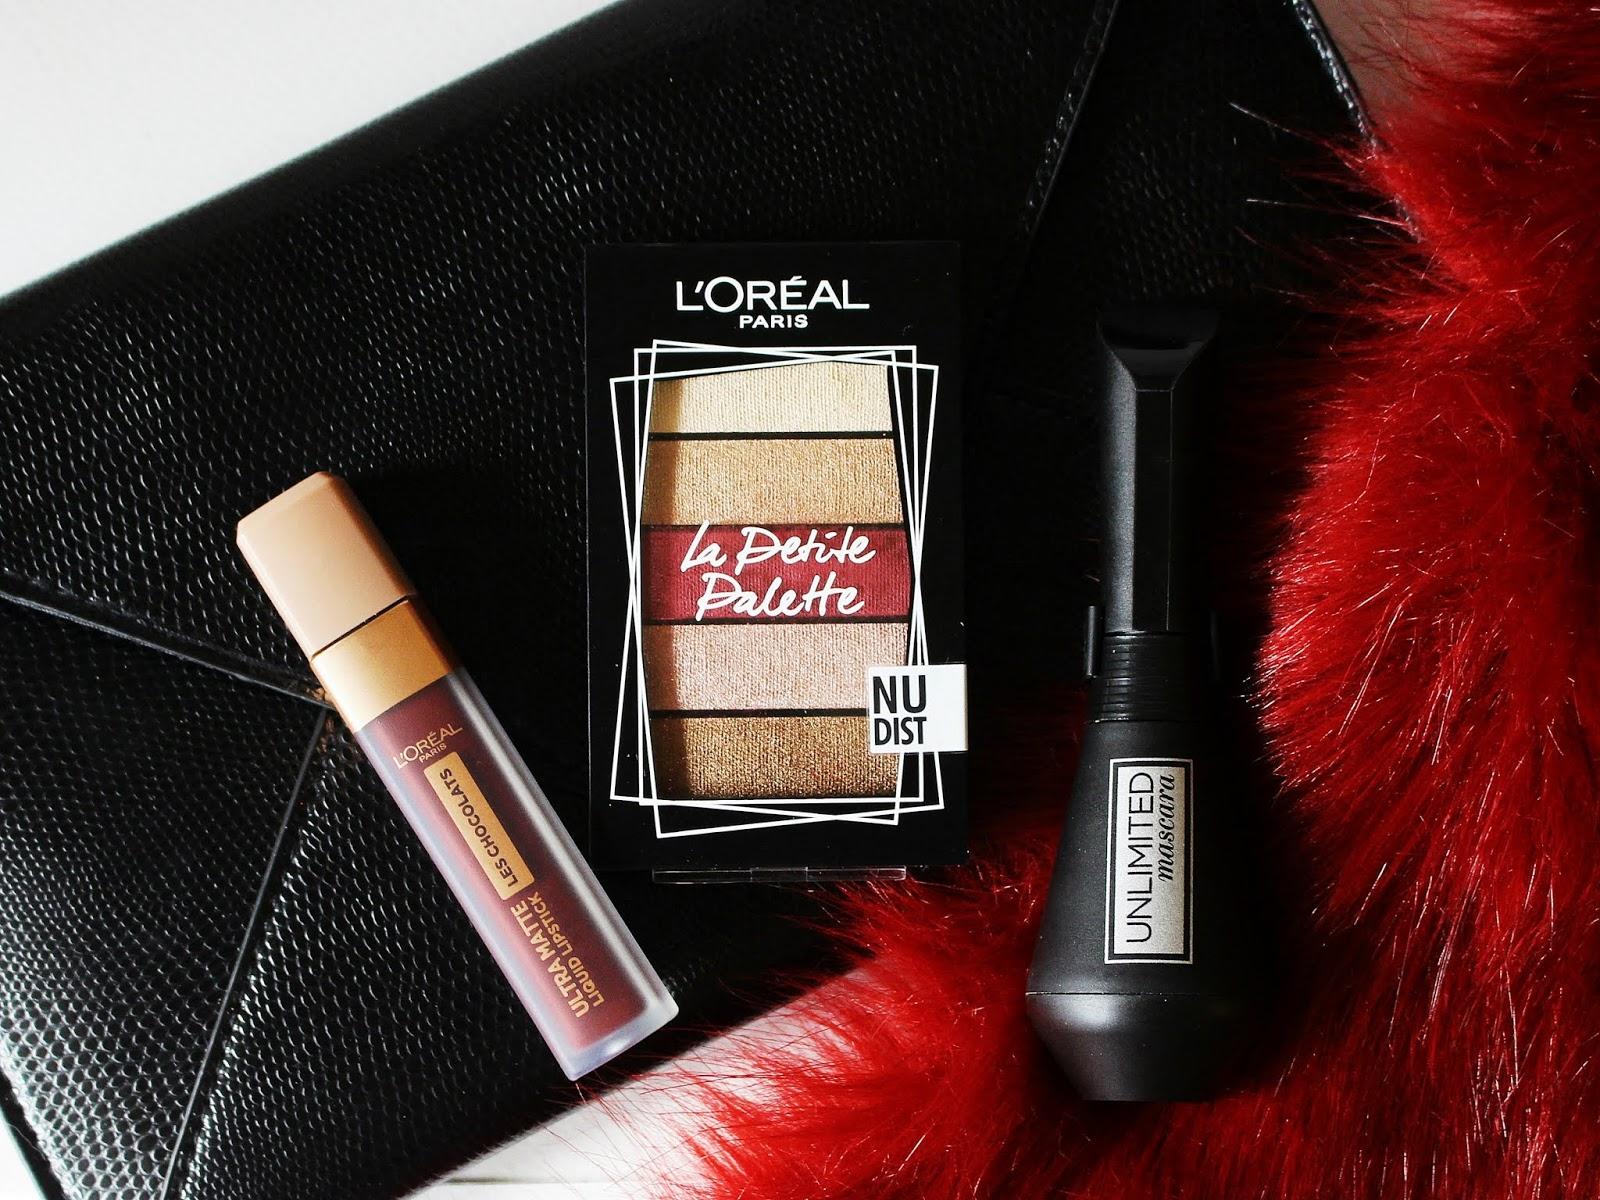 Drámai L'Oréal sminkek